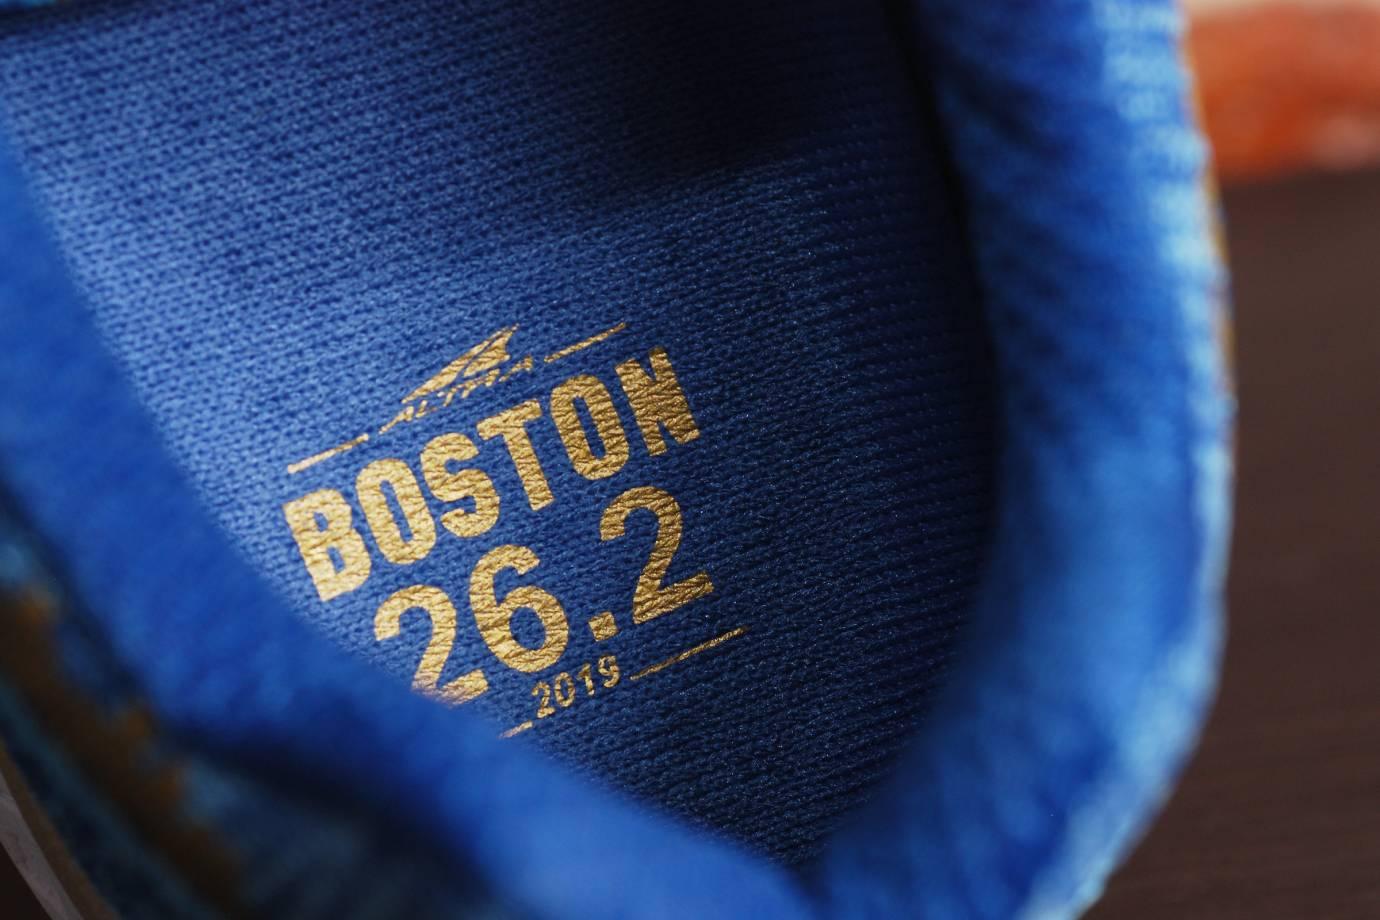 a label on the inside of an Altra Escalante Racer blue Boston Marathon edition shoe